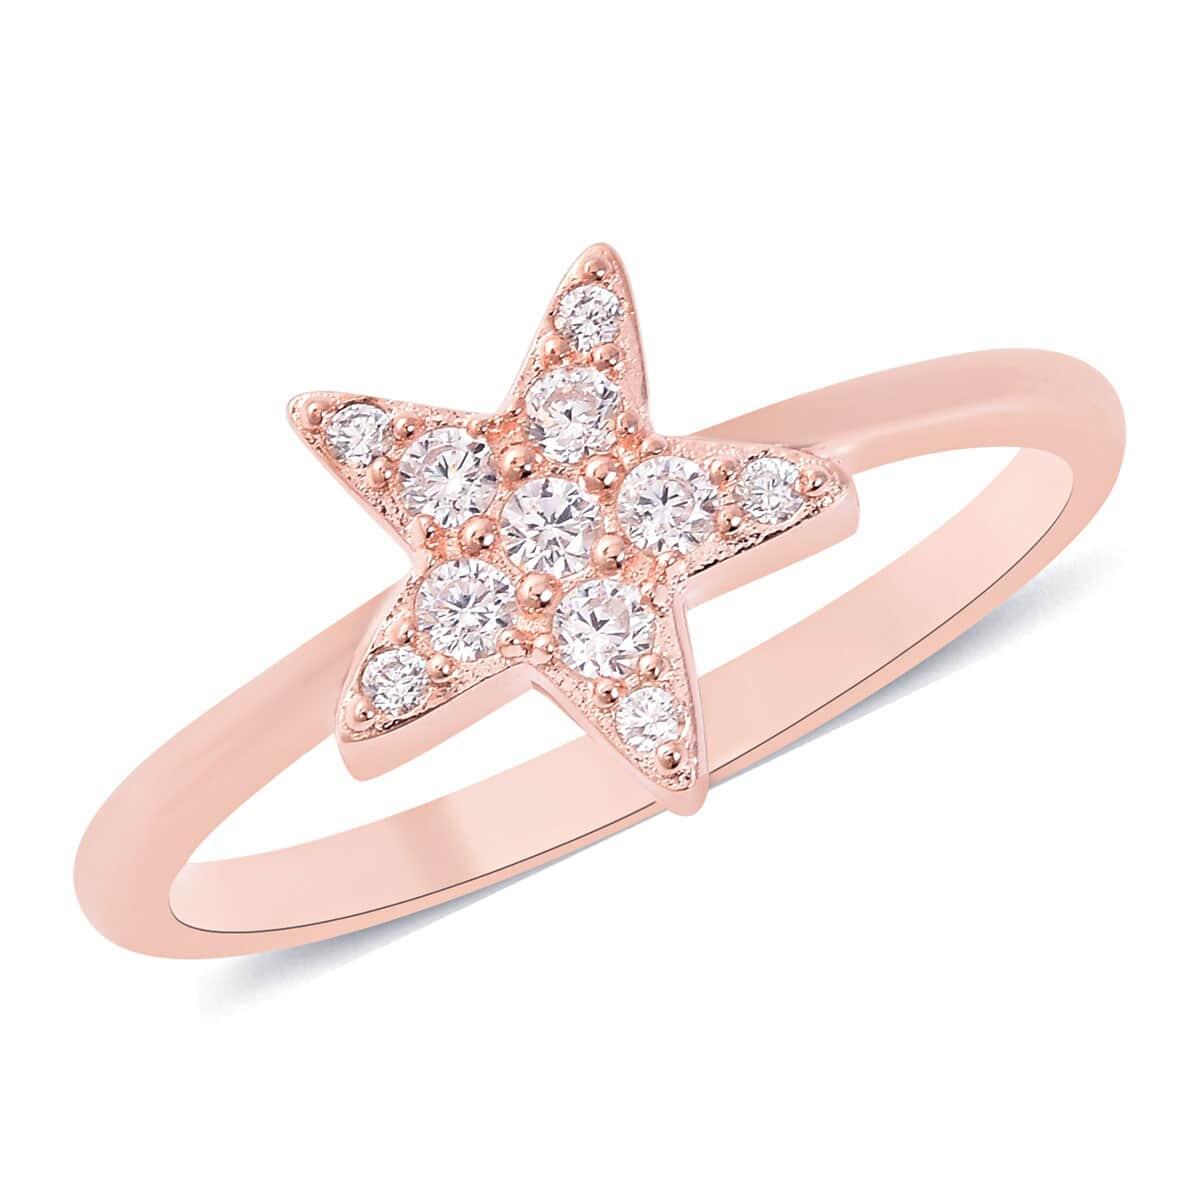 Earring Studs 0.3 to 4 Carat Moissanite Stud Earrings 14K rose-gold GH//VVS Round Brilliant Stud Earrings for Women perfect Jewelry Gifts for Women Teen Girls